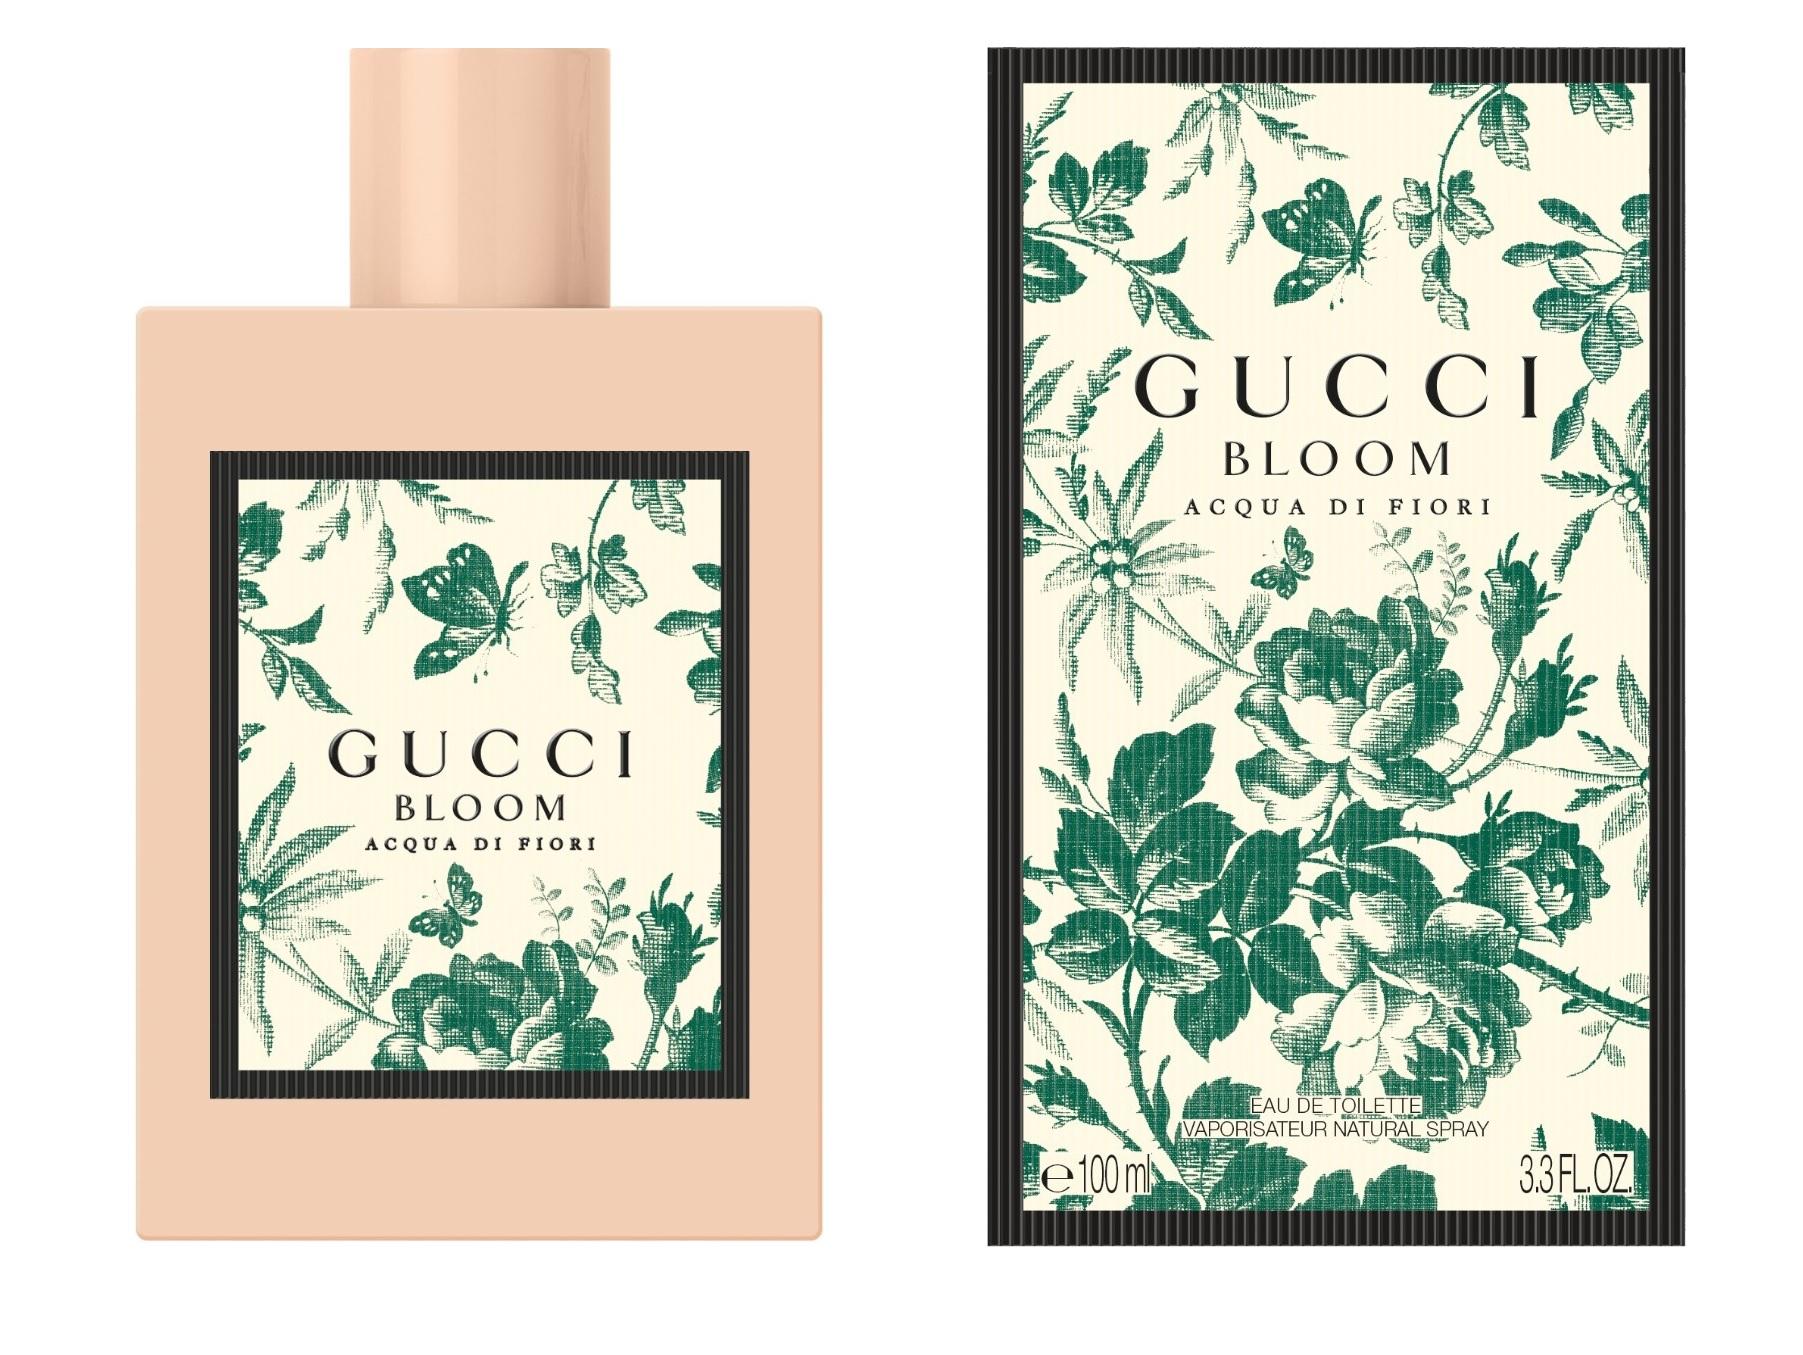 4e6360e6a Gucci Bloom Acqua Di Fiori الإصدار الجديد من غوتشي بلوم ~ إصدار جديد